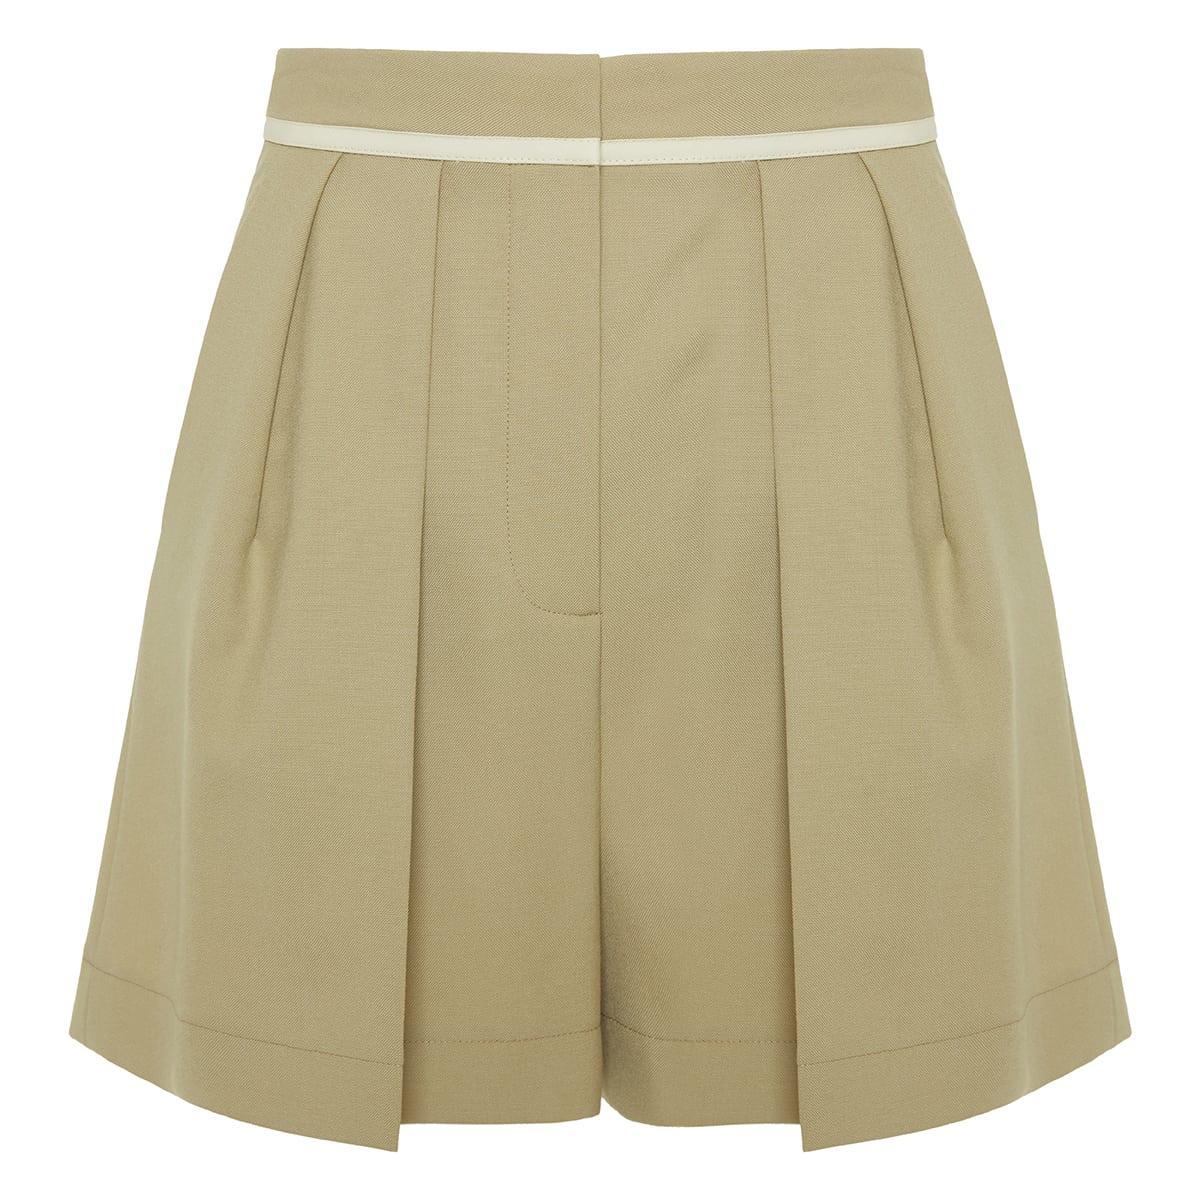 Ariel pleated wool shorts